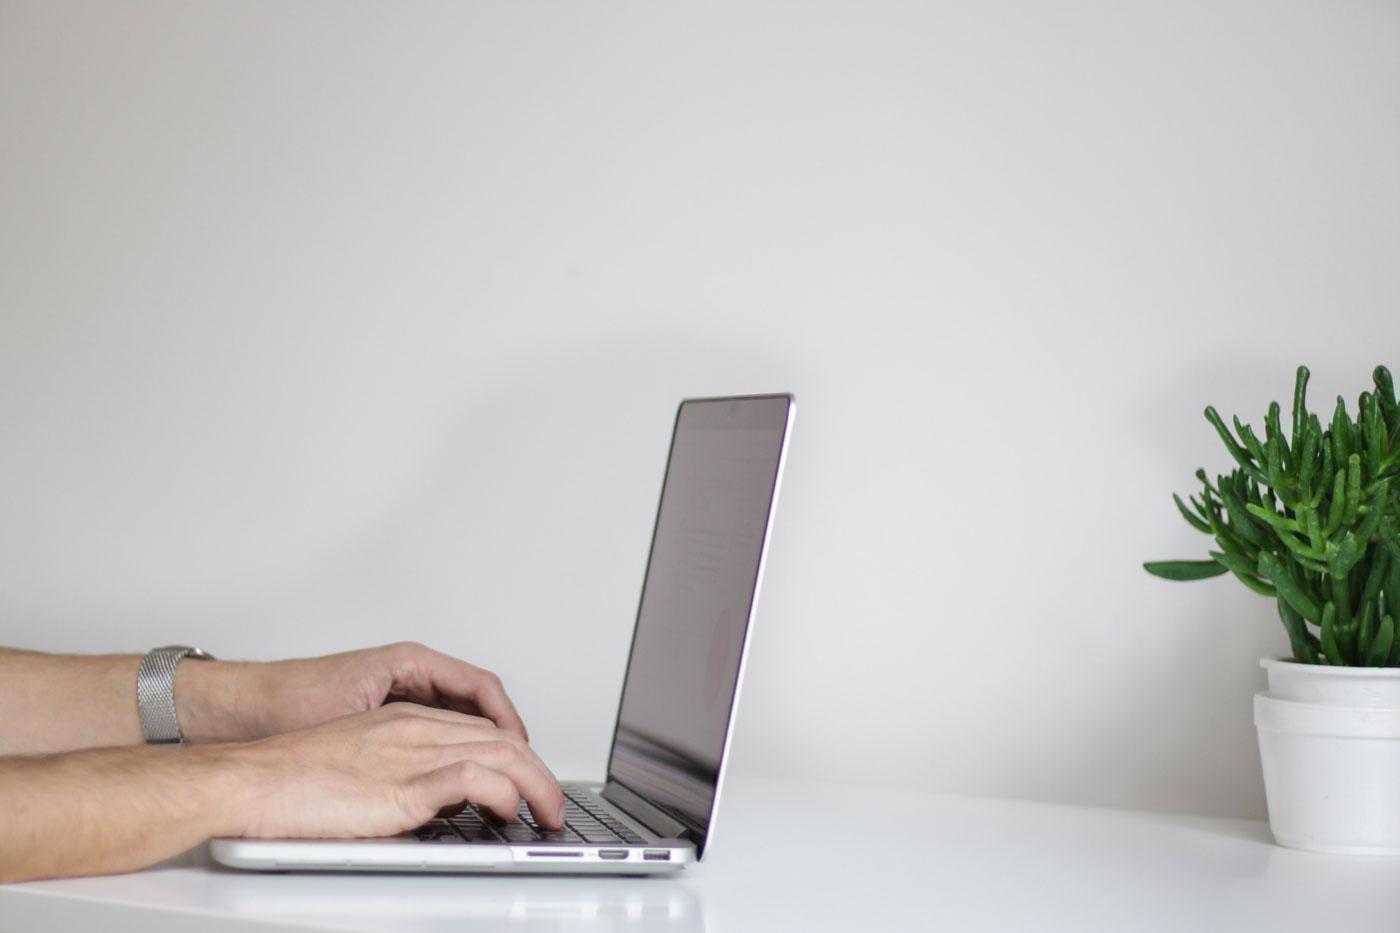 👨🏼💻 Švedśka Beetroot prydbala žytomyrśku IT-kompaniju Oldmin